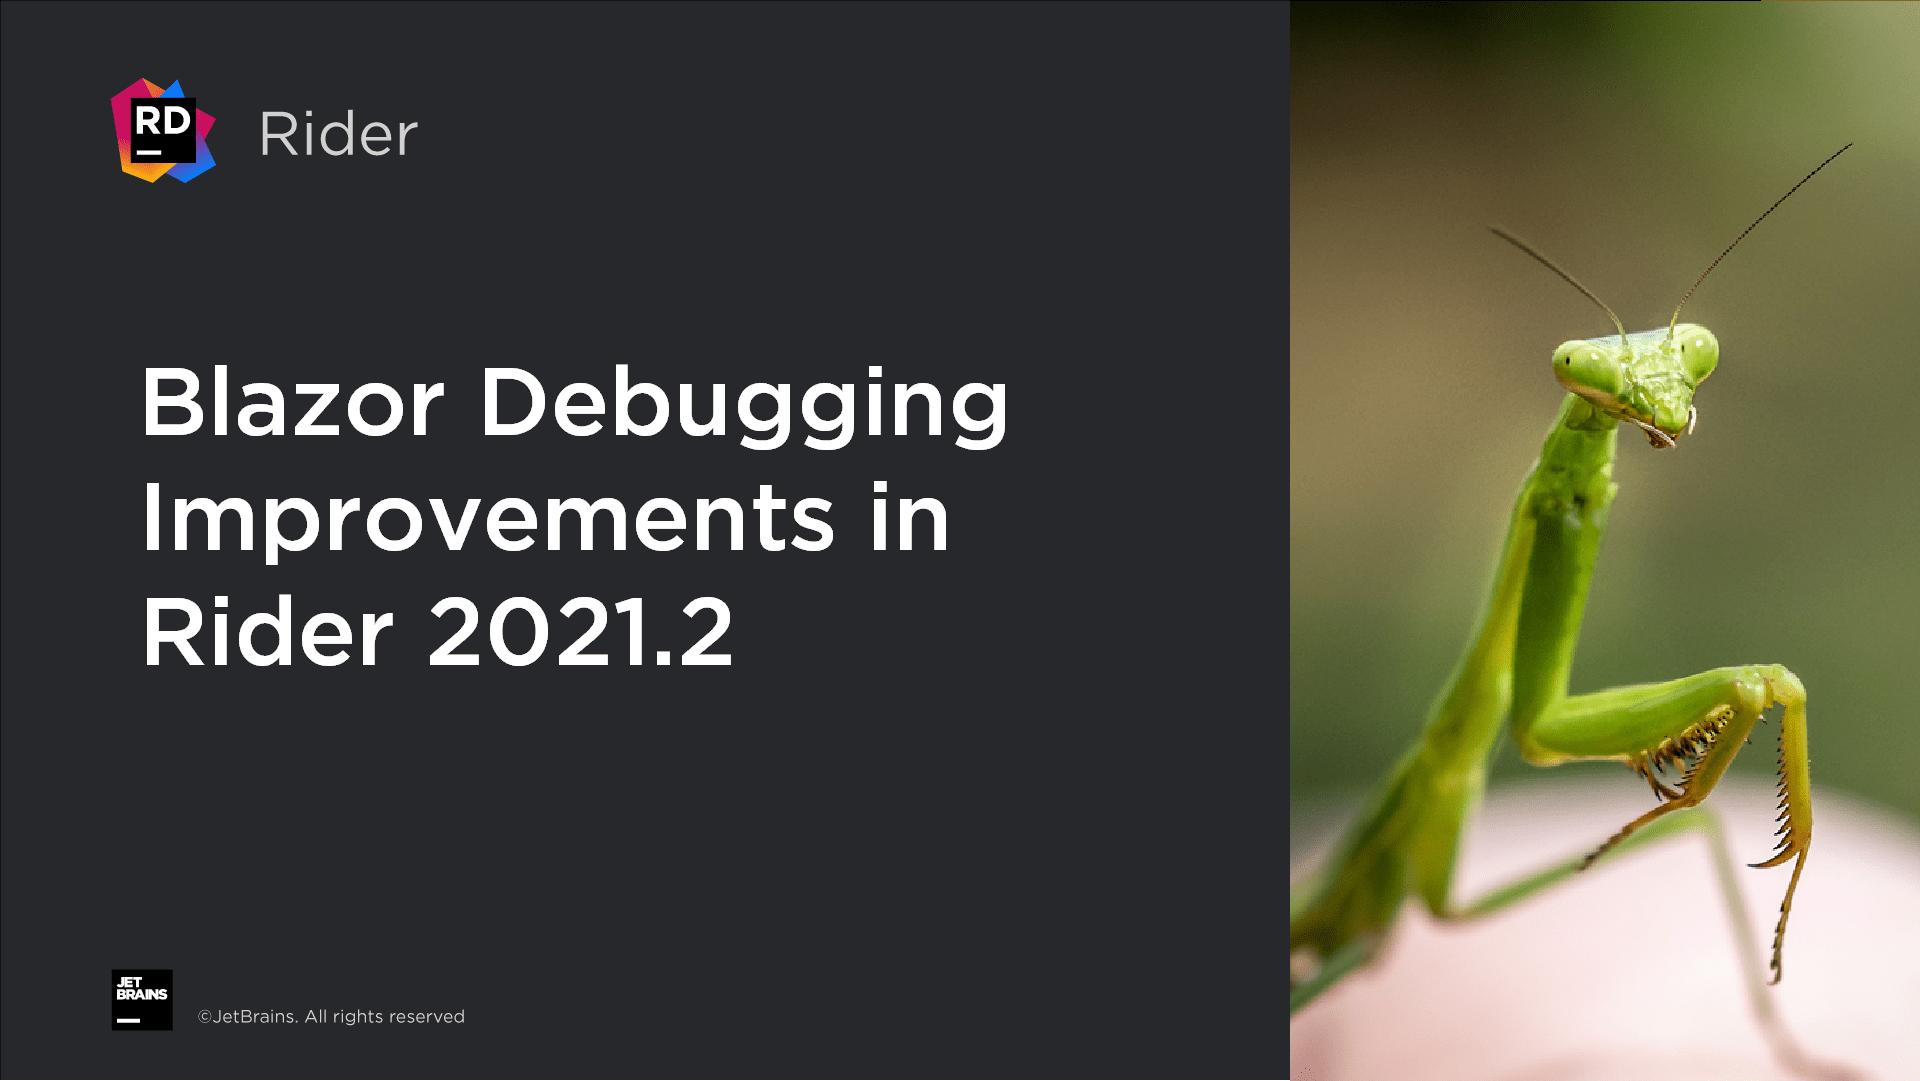 Blazor Debugging Improvements in Rider 2021.2